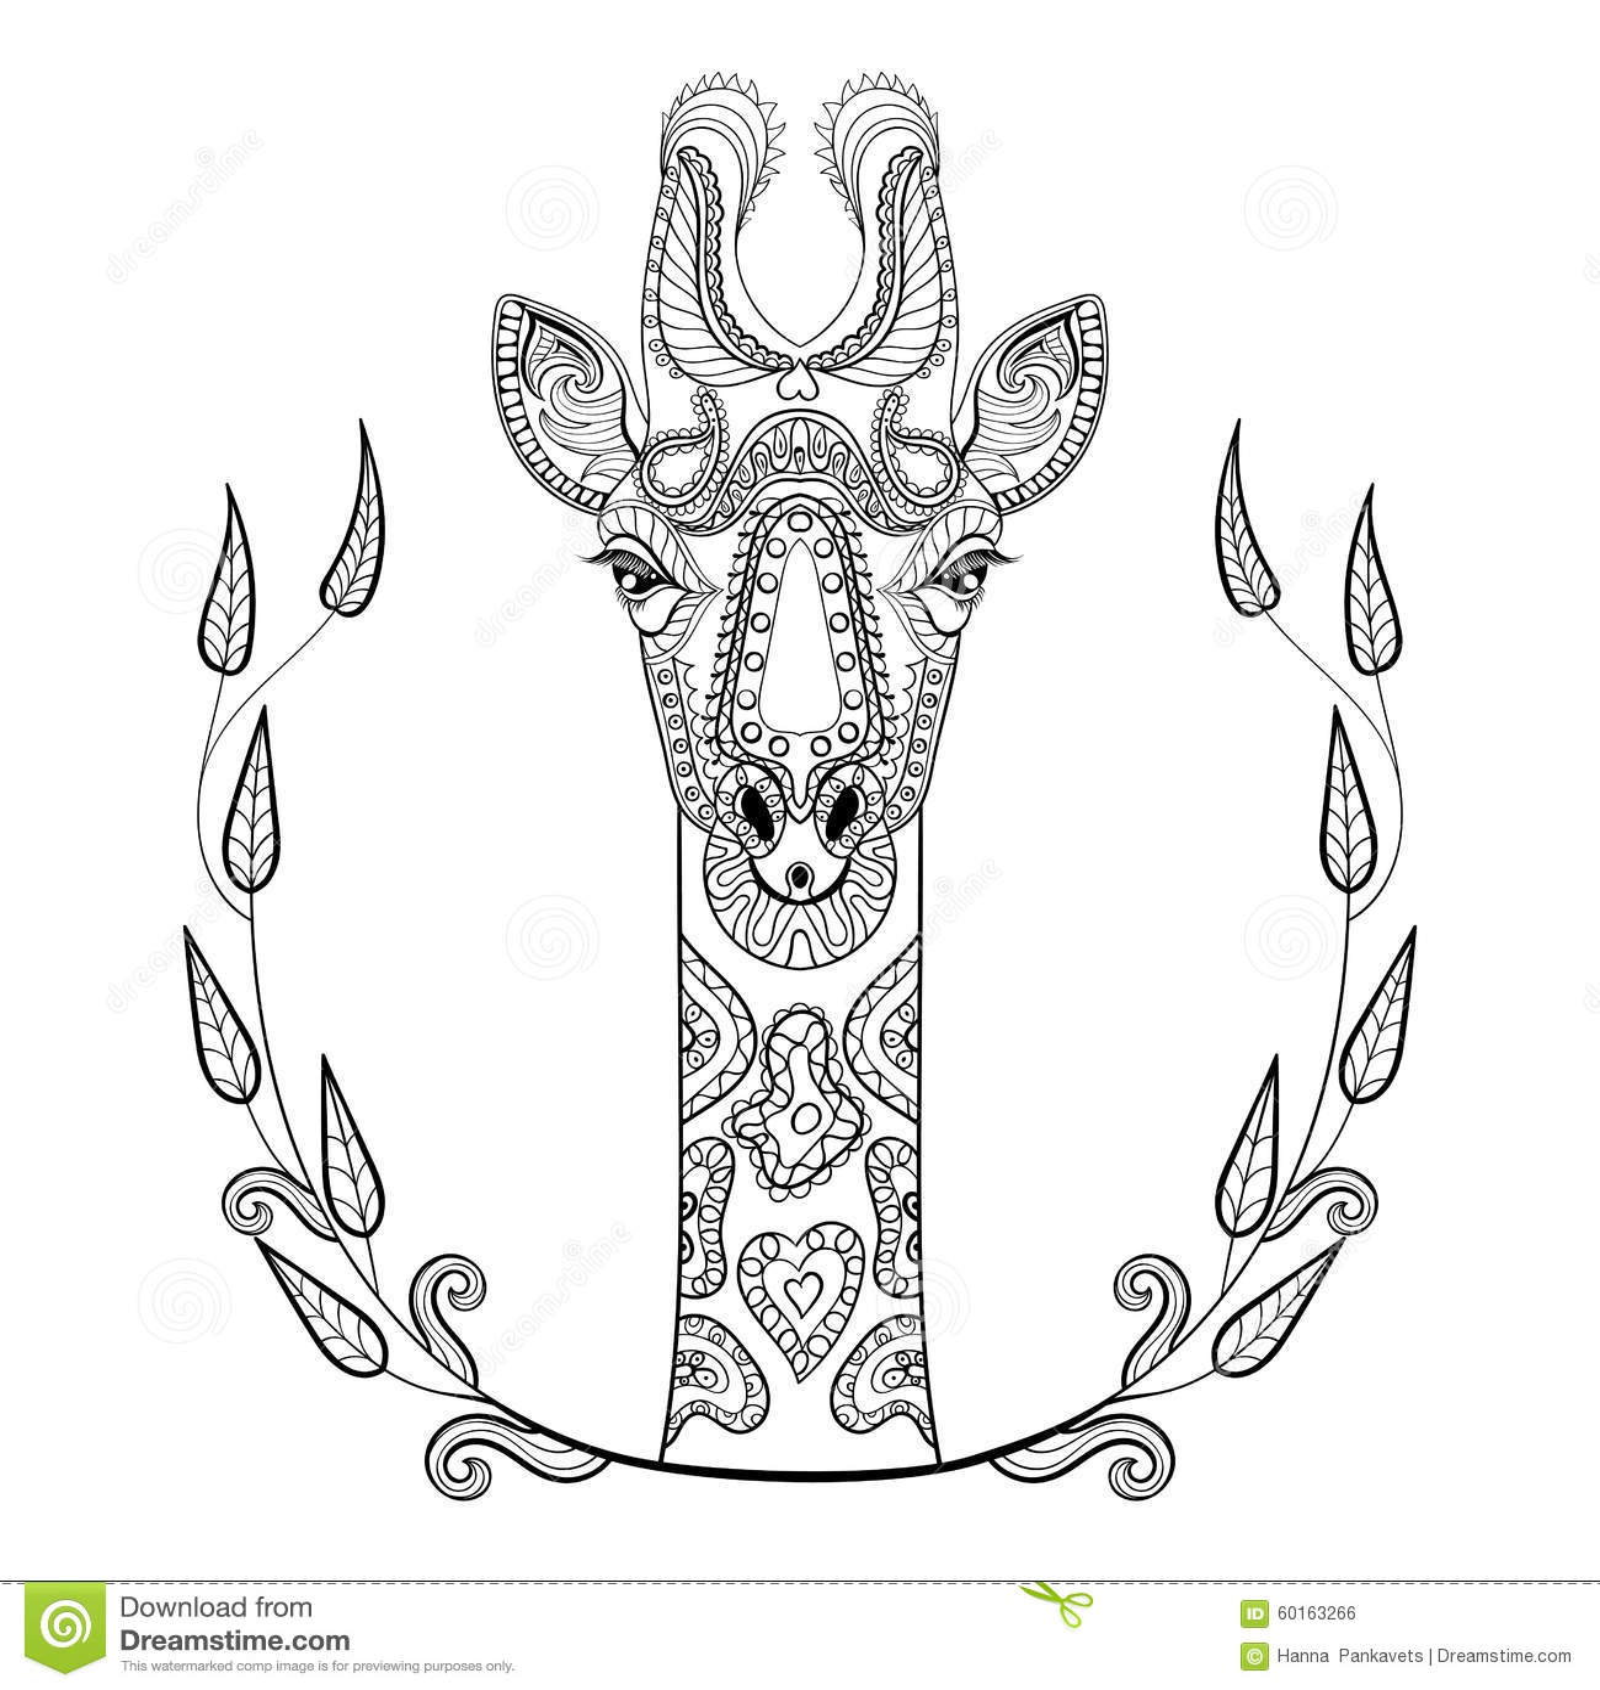 Zentangle Giraffe Head Totem In Frame For Adult Anti